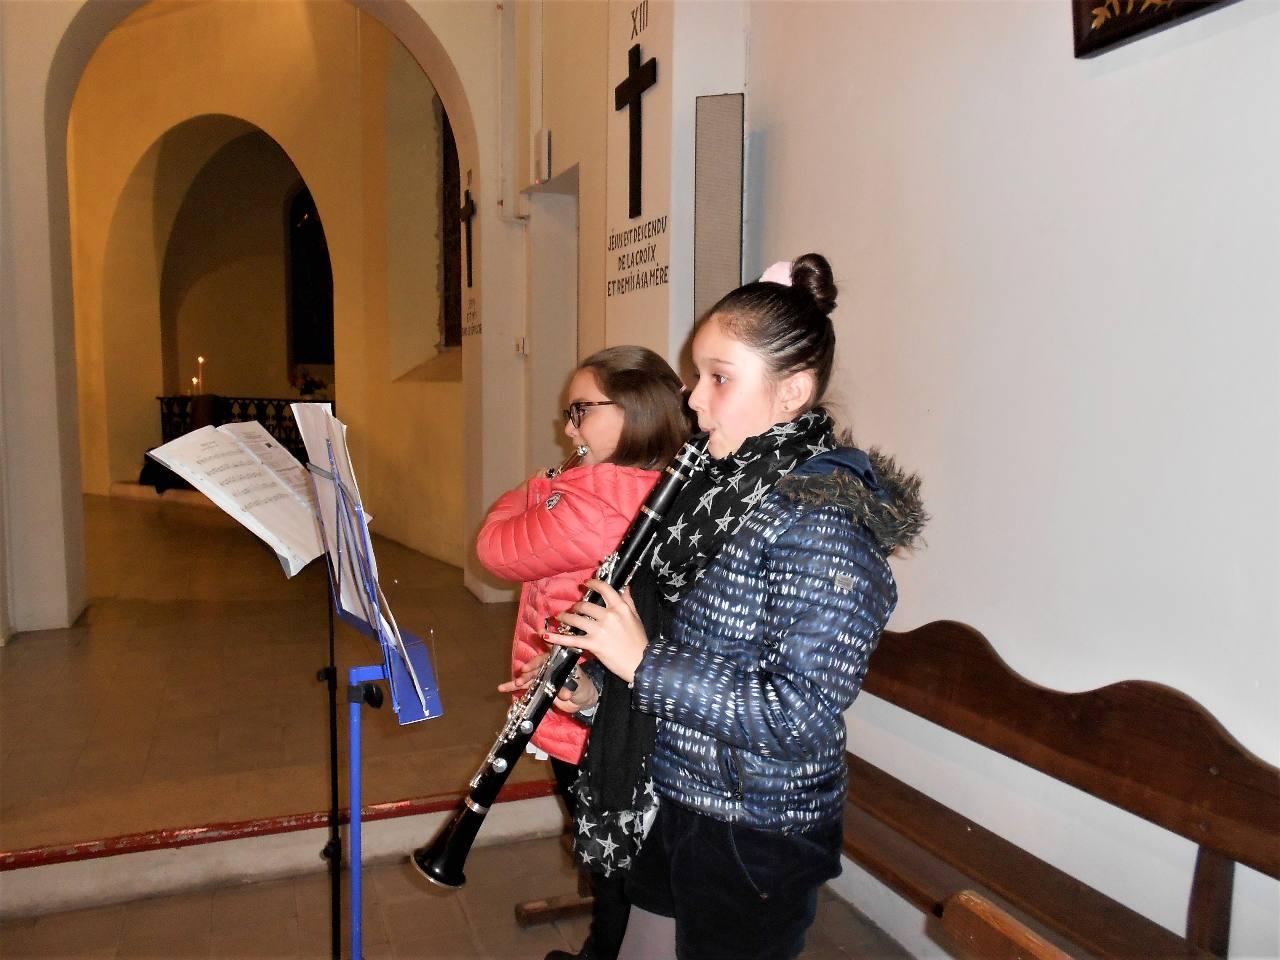 Méditation musicale avec Elena et Chloé